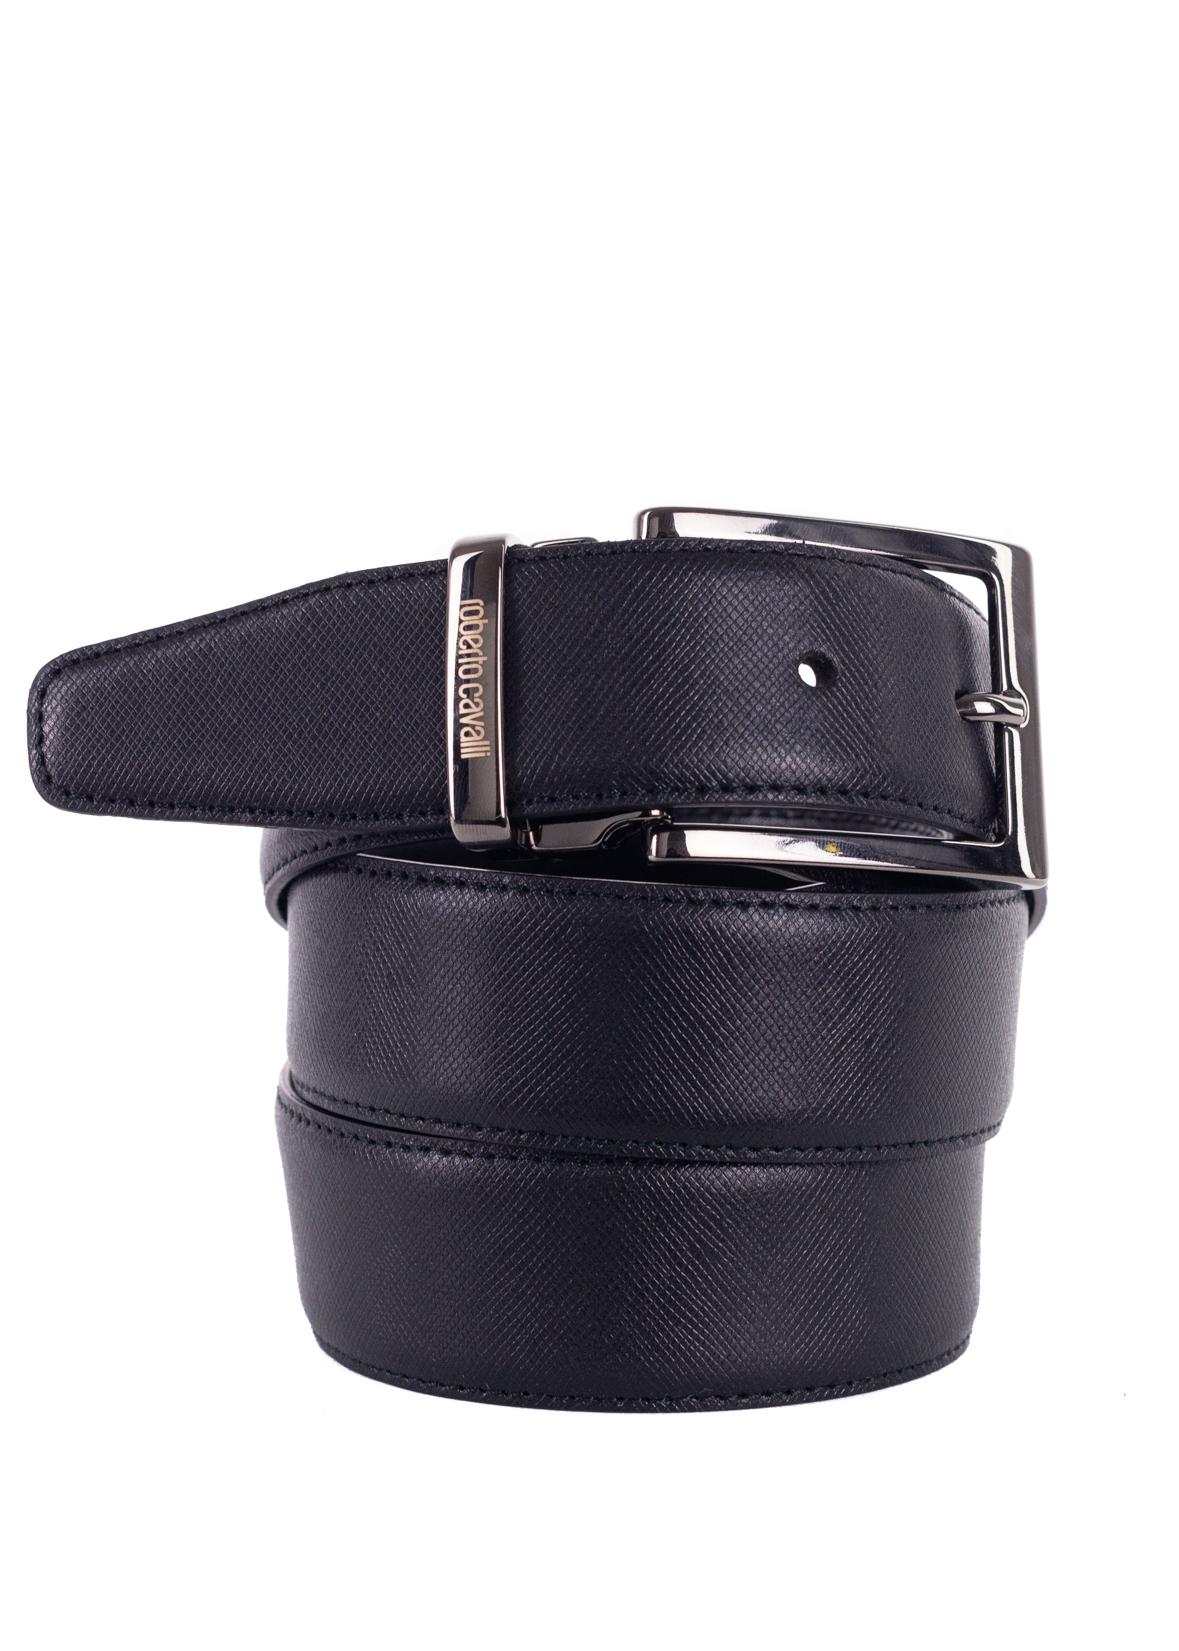 Roberto Cavalli Mens Black Grained Leather Square Buckle Belts Sz44~RTL$325